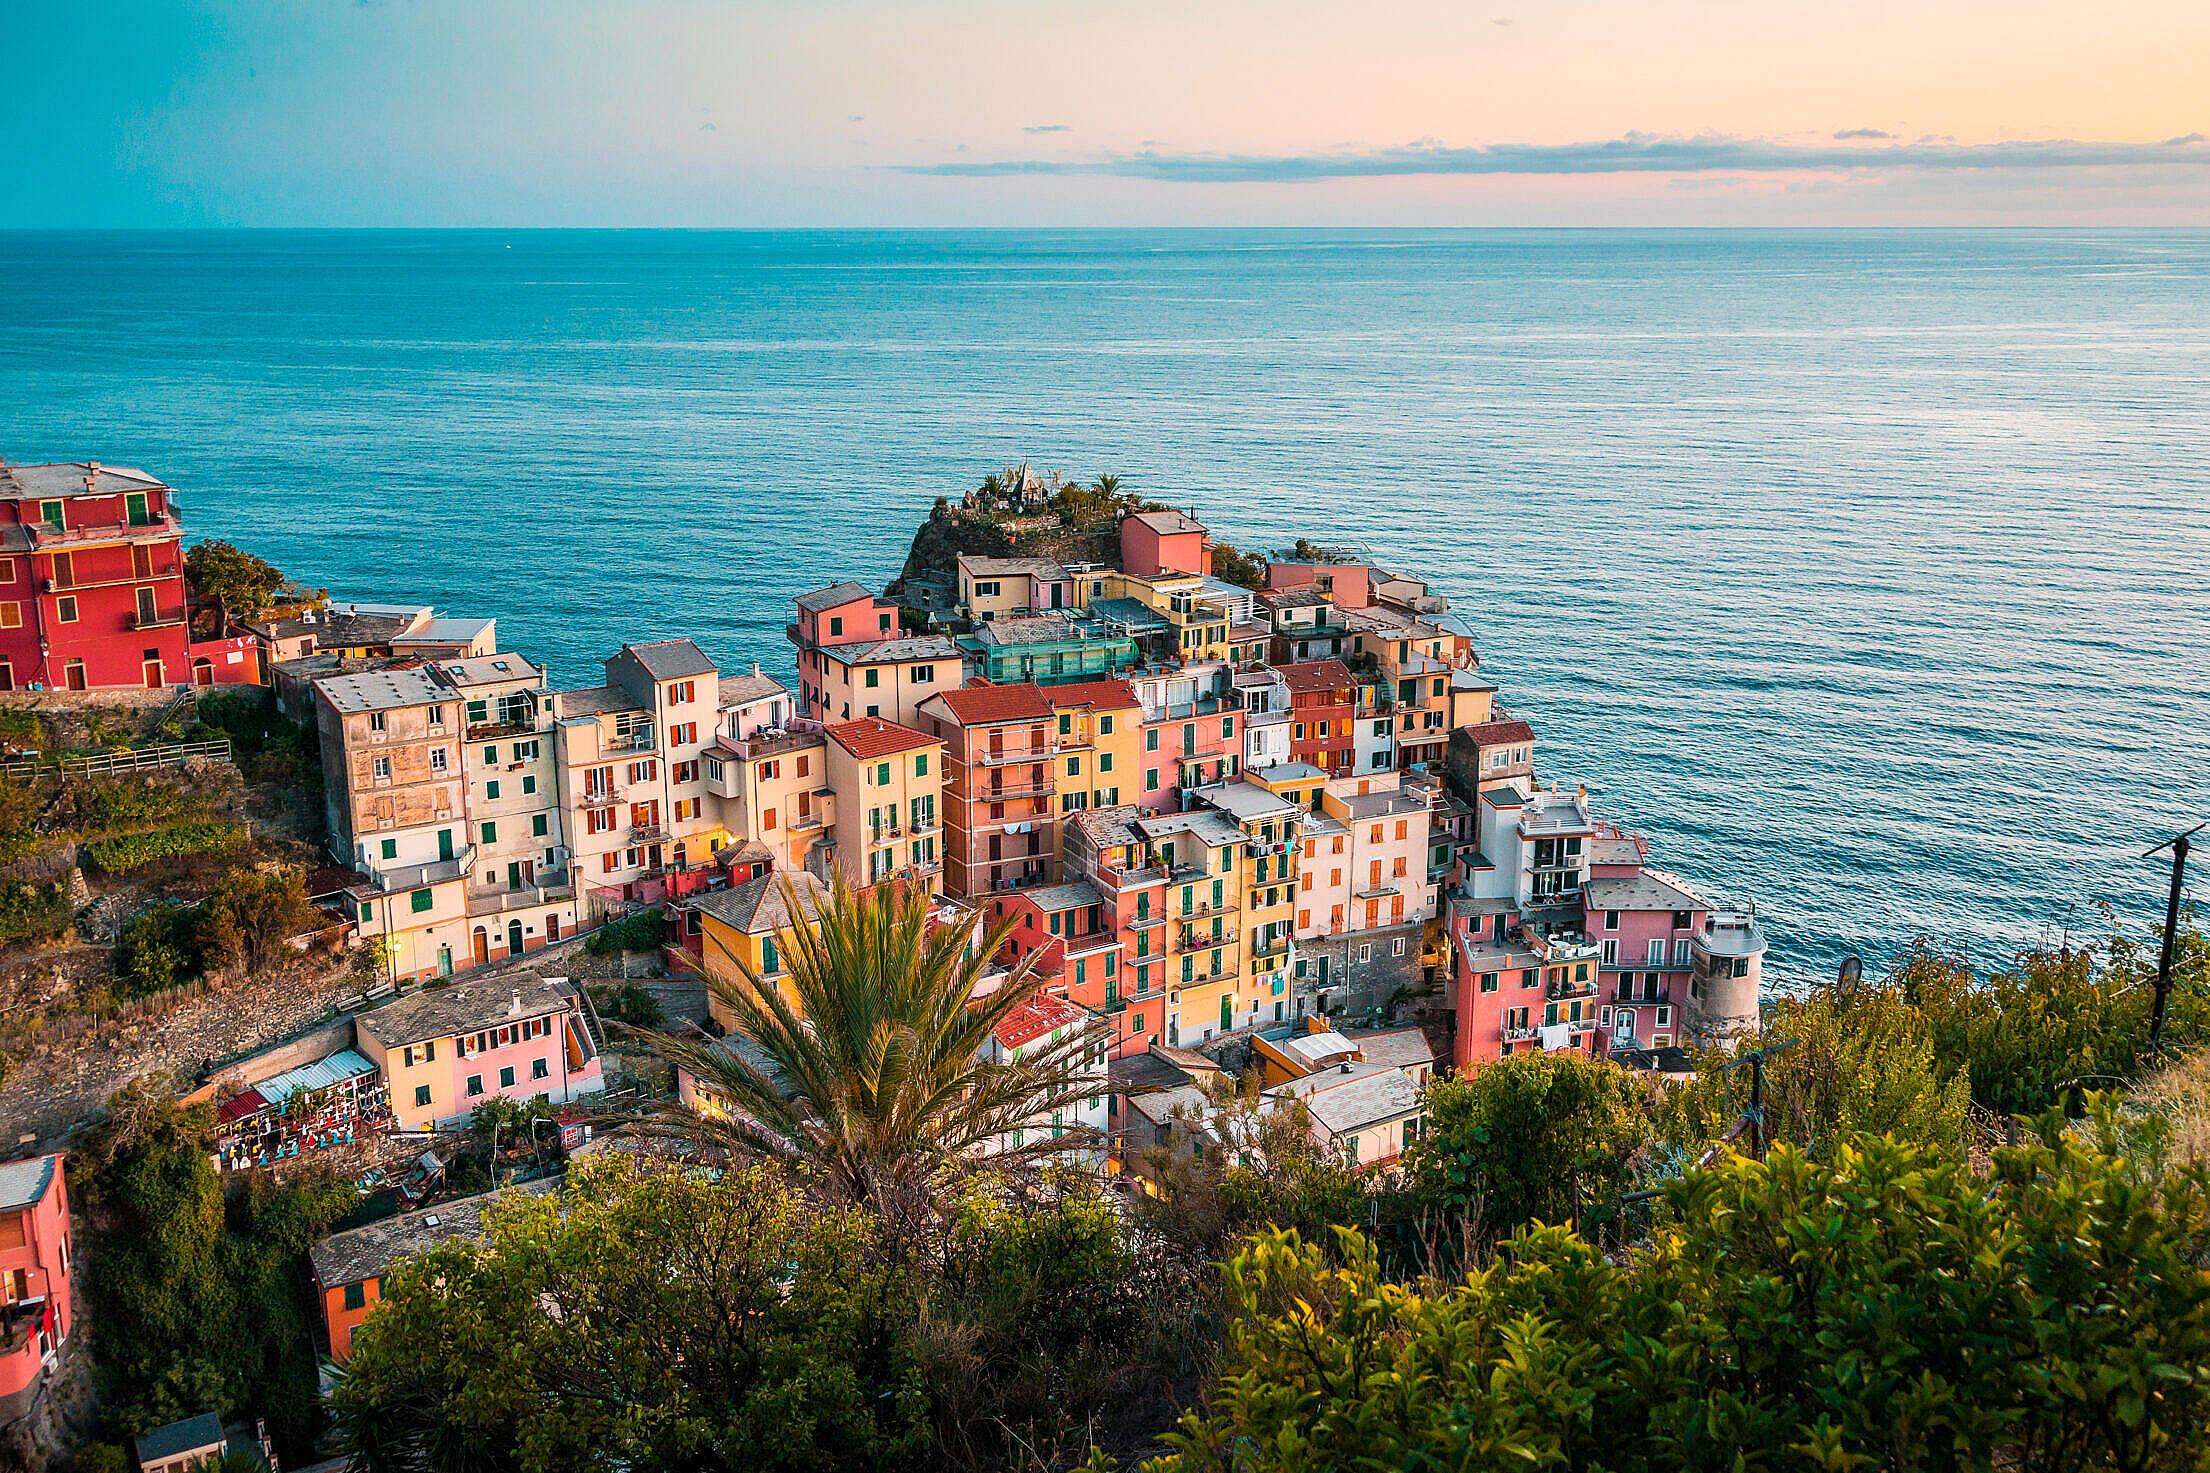 Manarola Most Beautiful Village in Italy Free Stock Photo